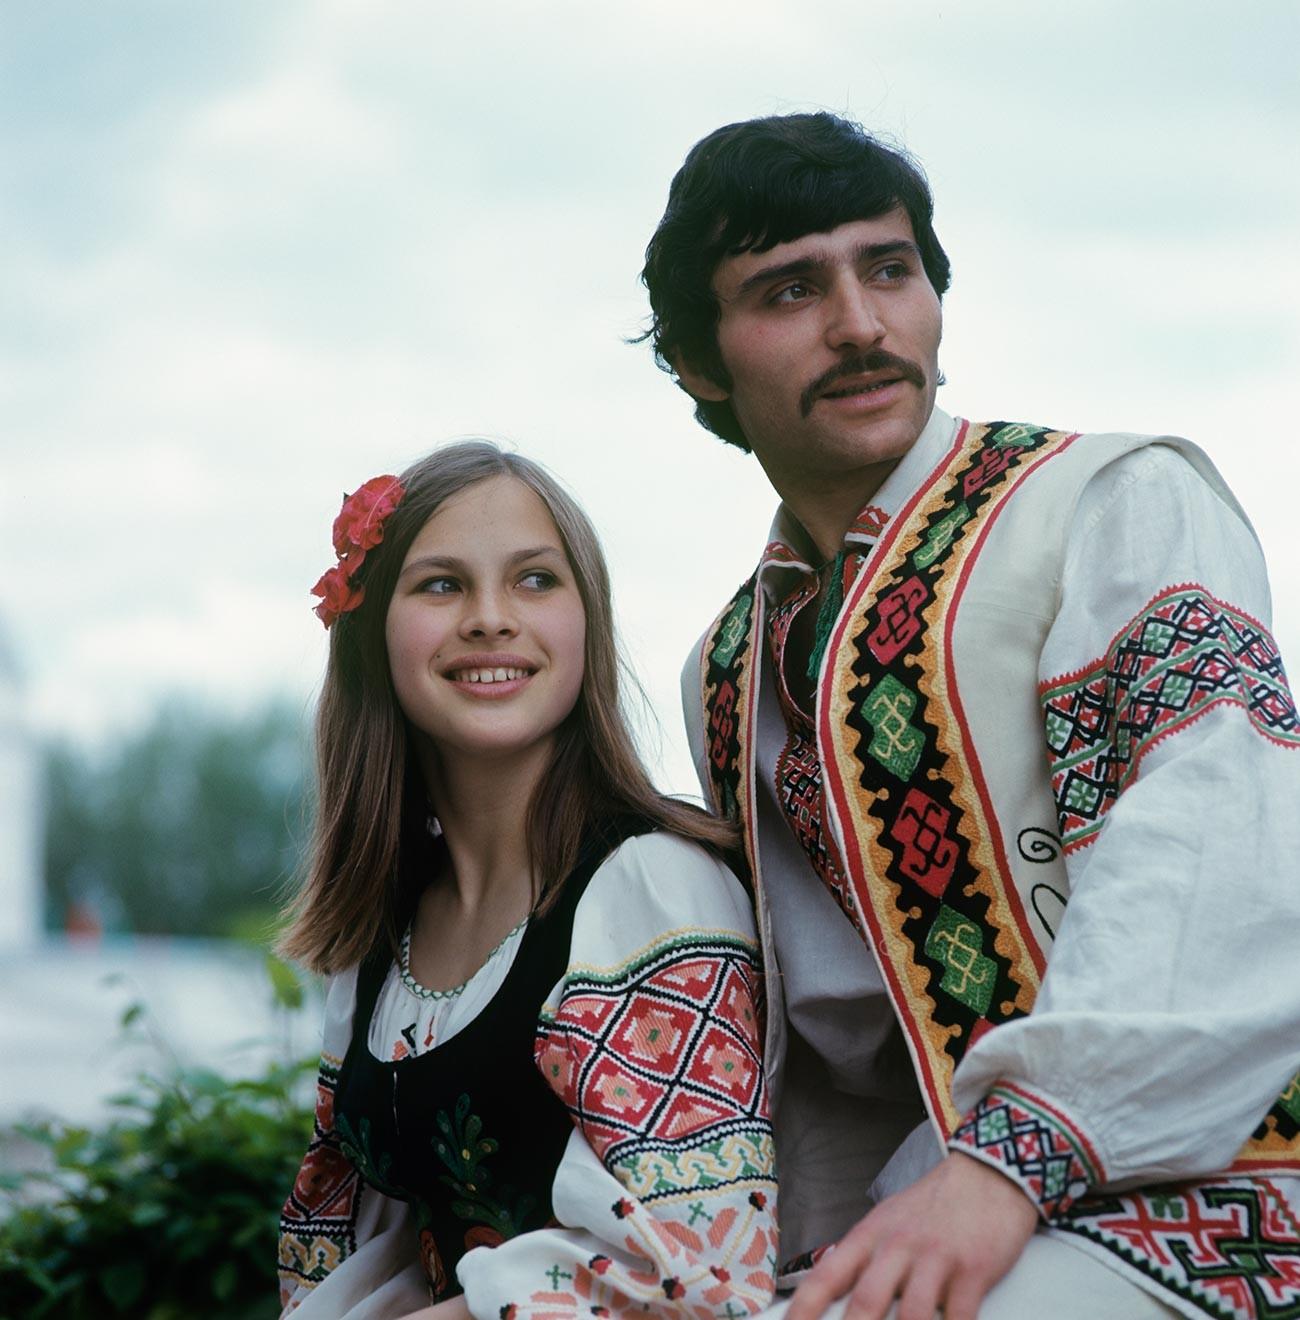 Участники ансамбля народного танца «Молдаванеска», 1975